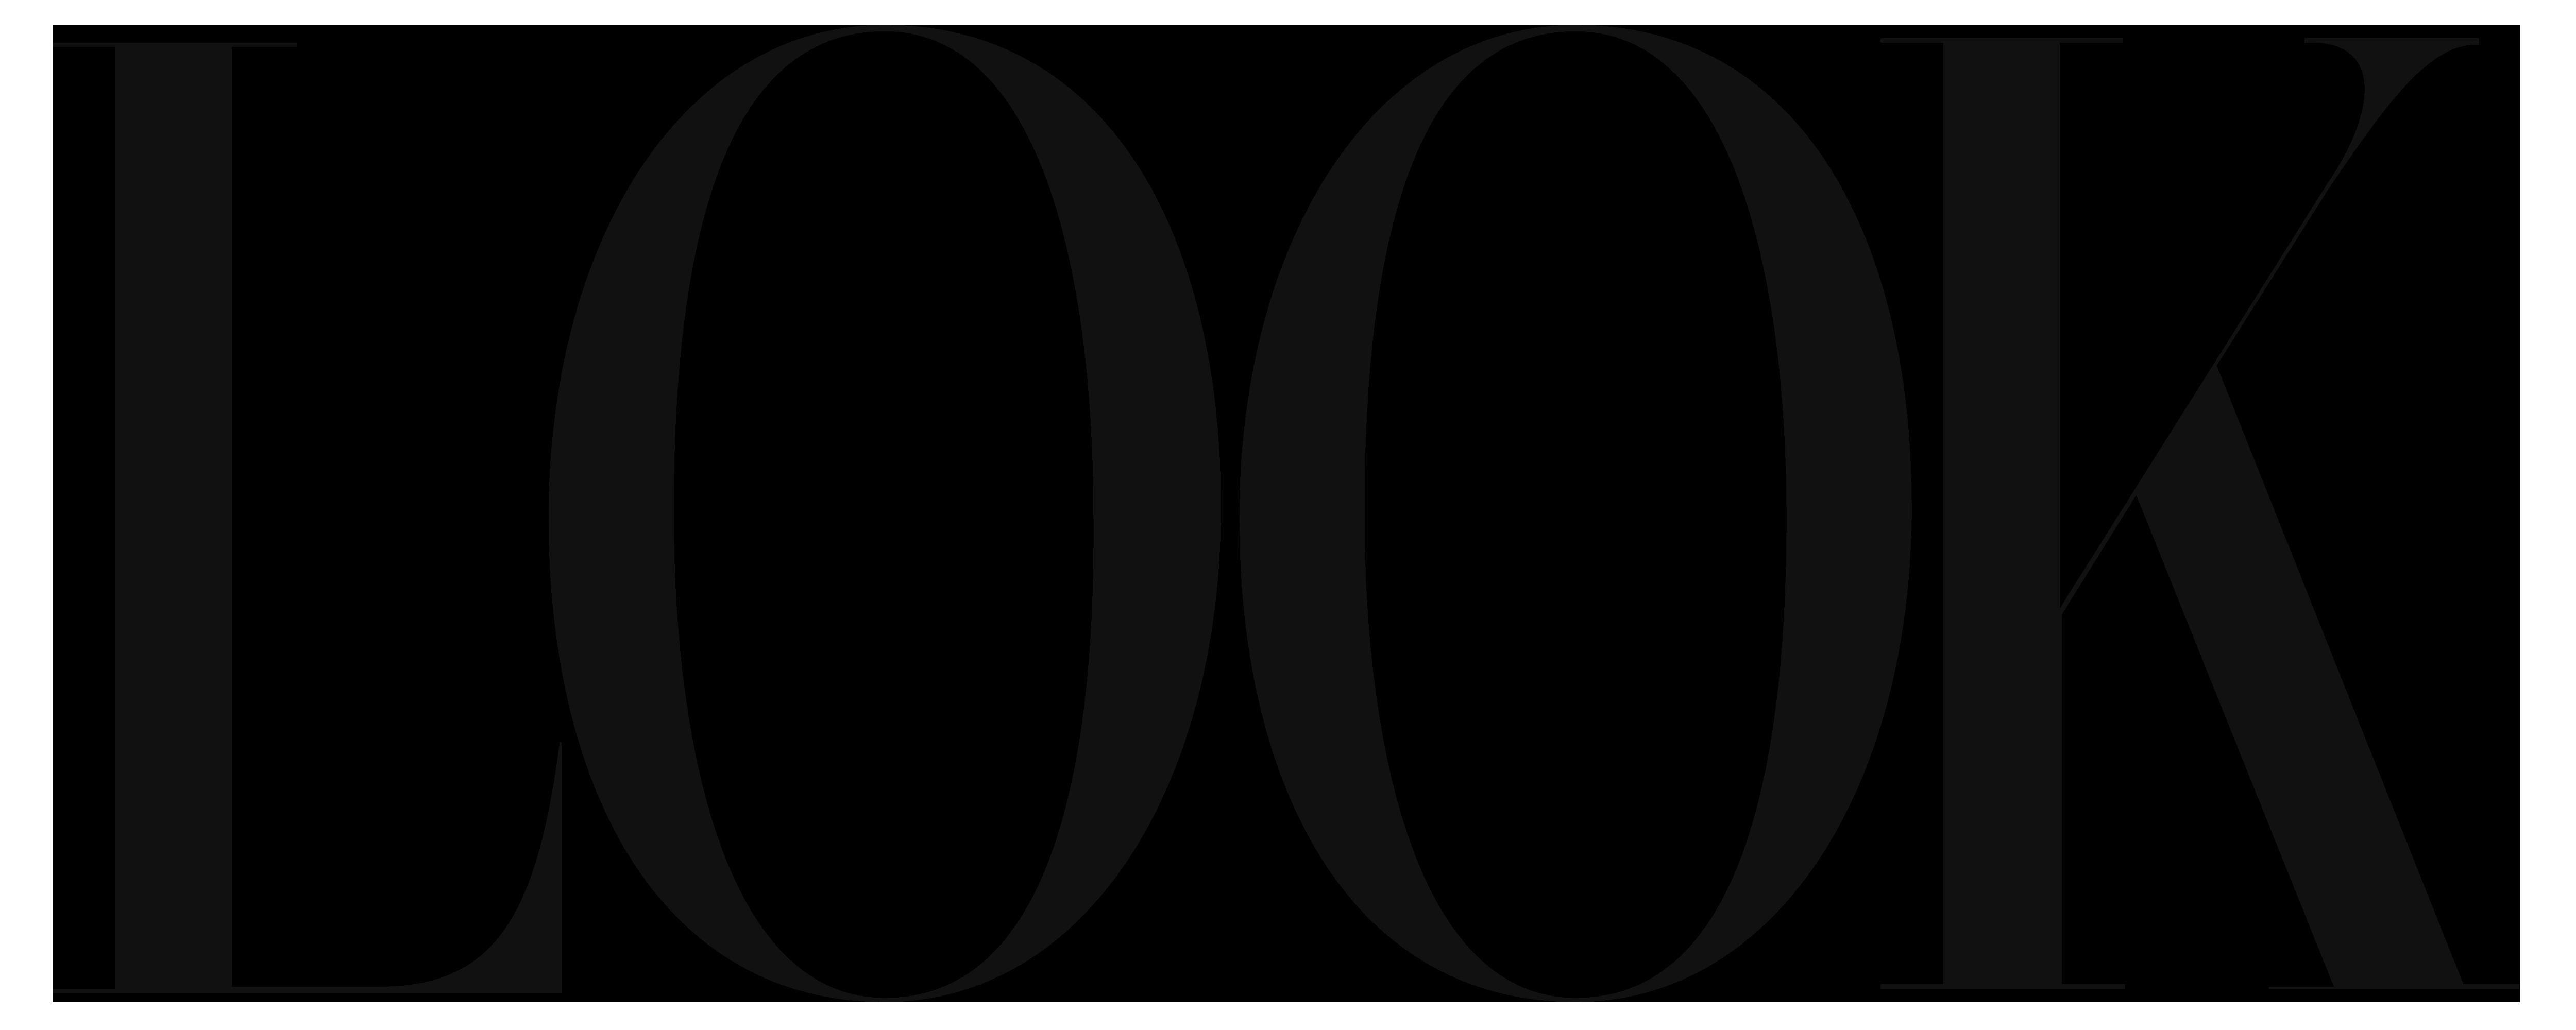 Look magazine – Logos Download